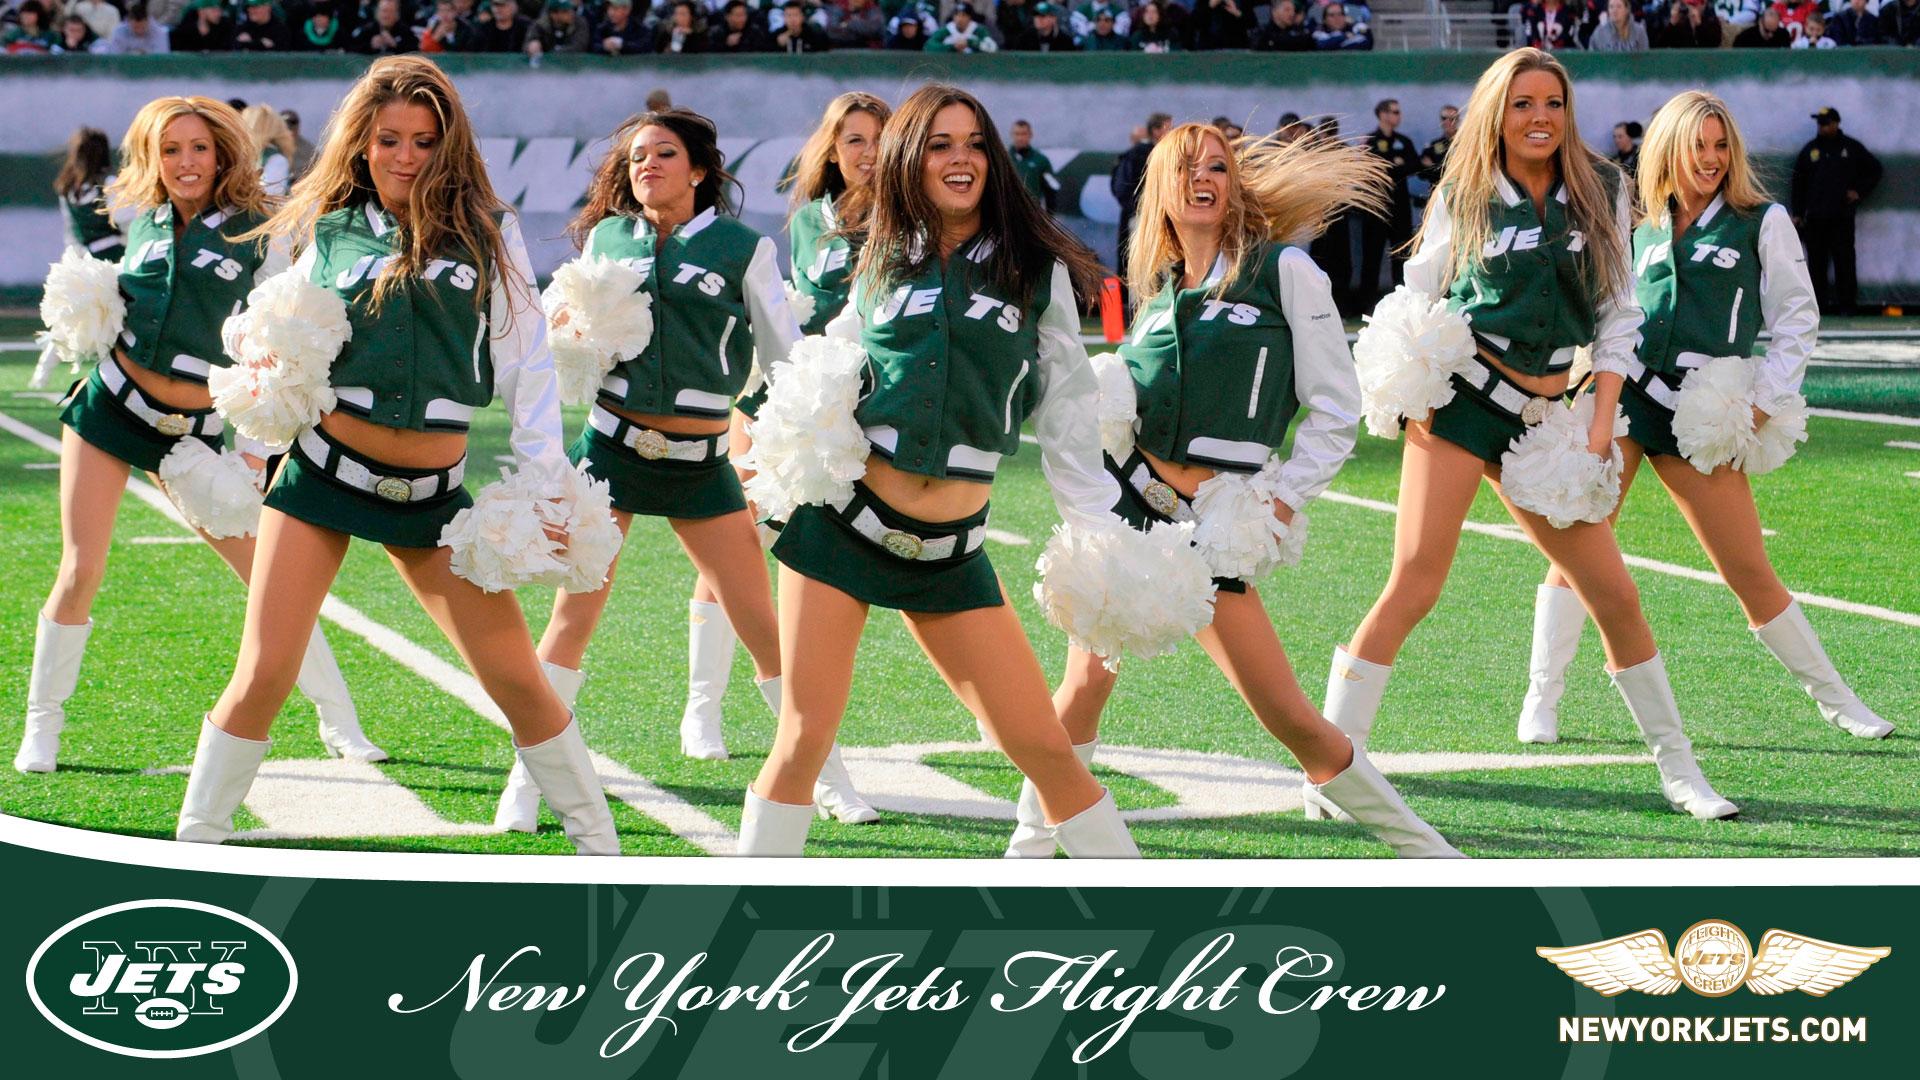 Miami Beach Dolphins Cheerleader New York Jets Cheerleaders 532967 1920x1080